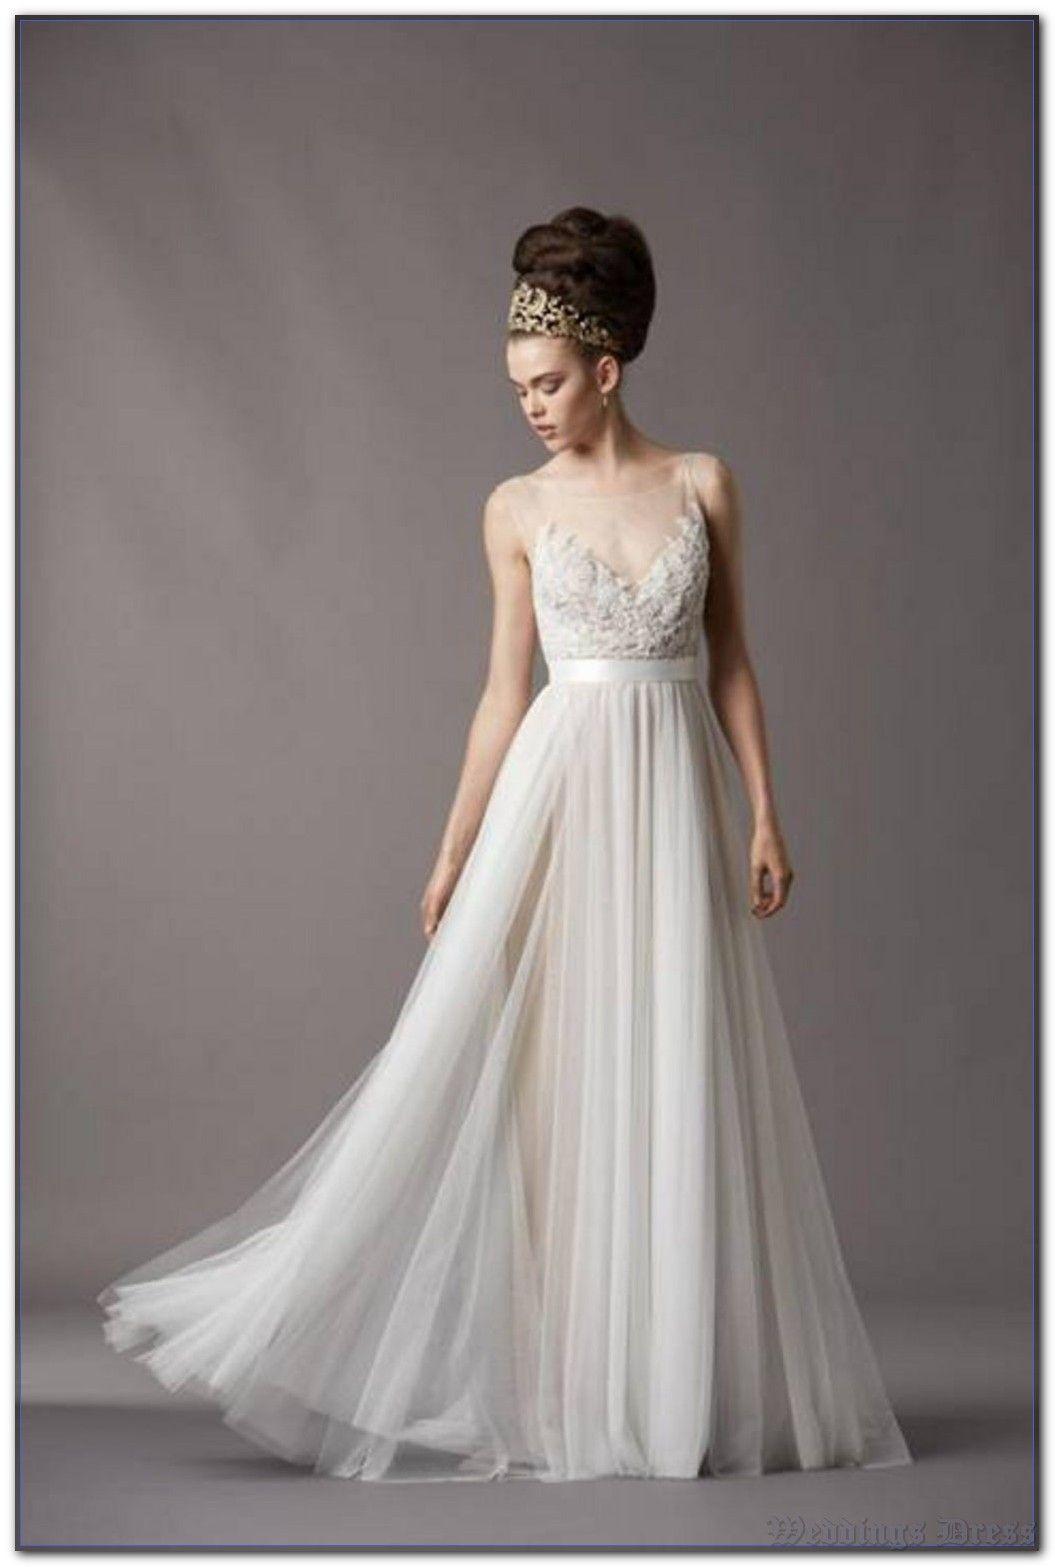 5 Best Ways To Sell Weddings Dress